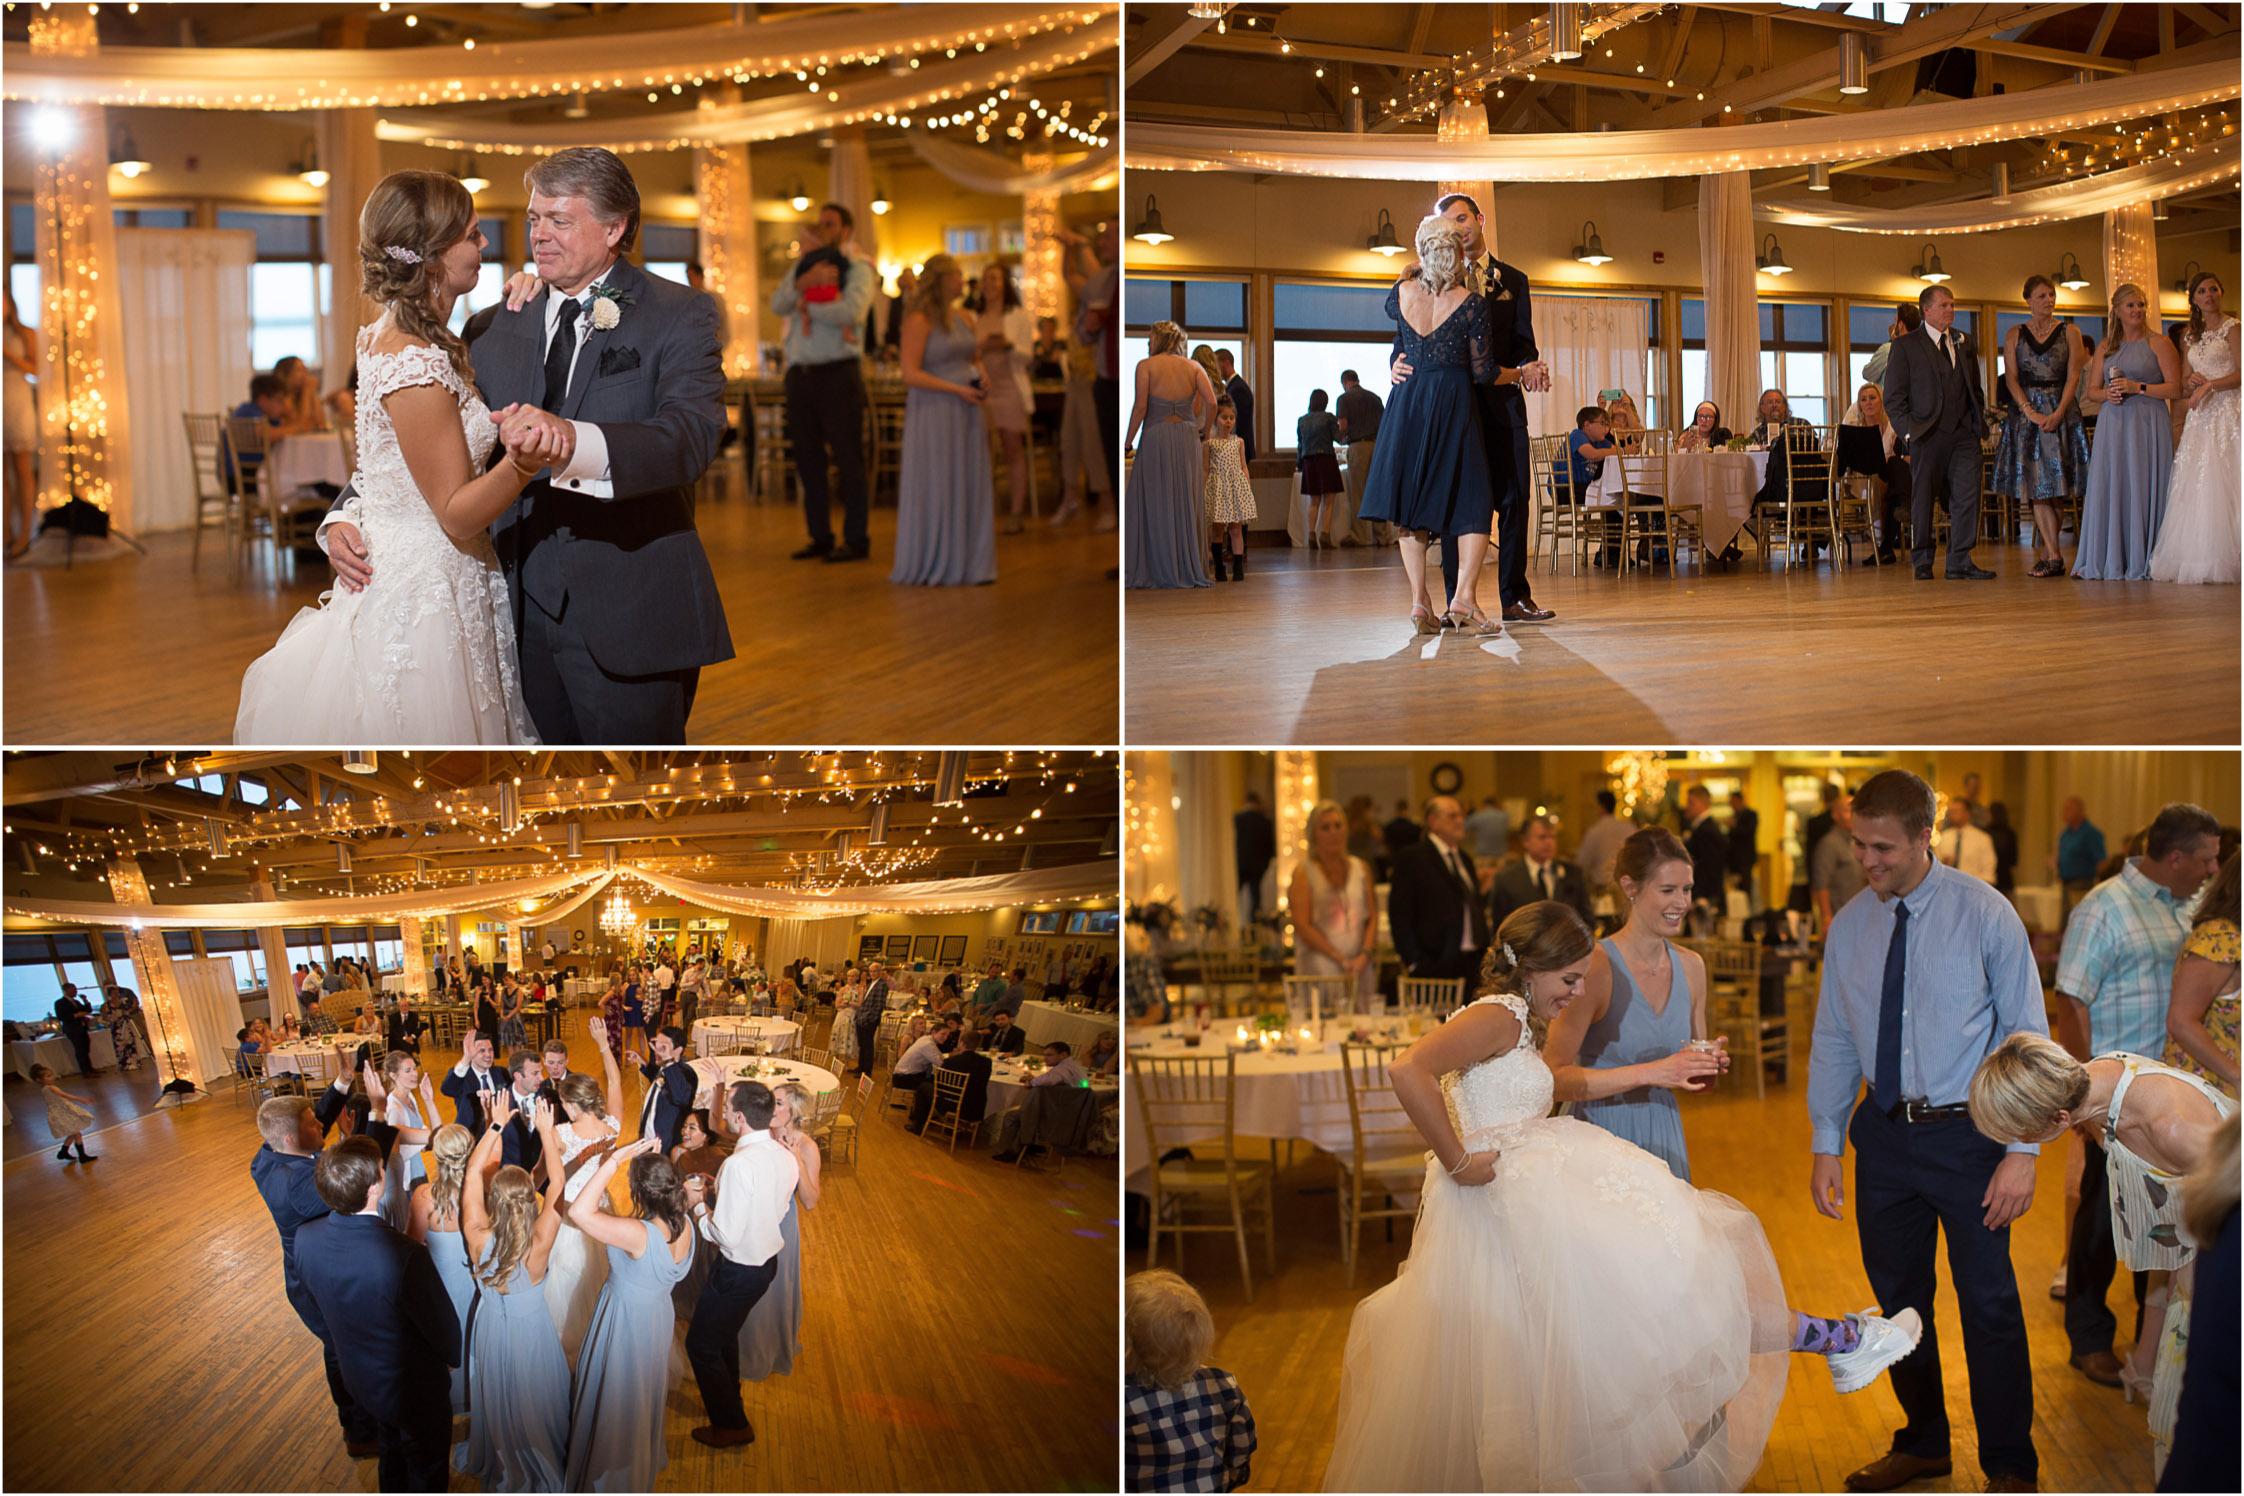 20-northern-minnesota-summer-lake-wedding-reception-dances-lakeside-chophouse-mahonen-photography.jpg